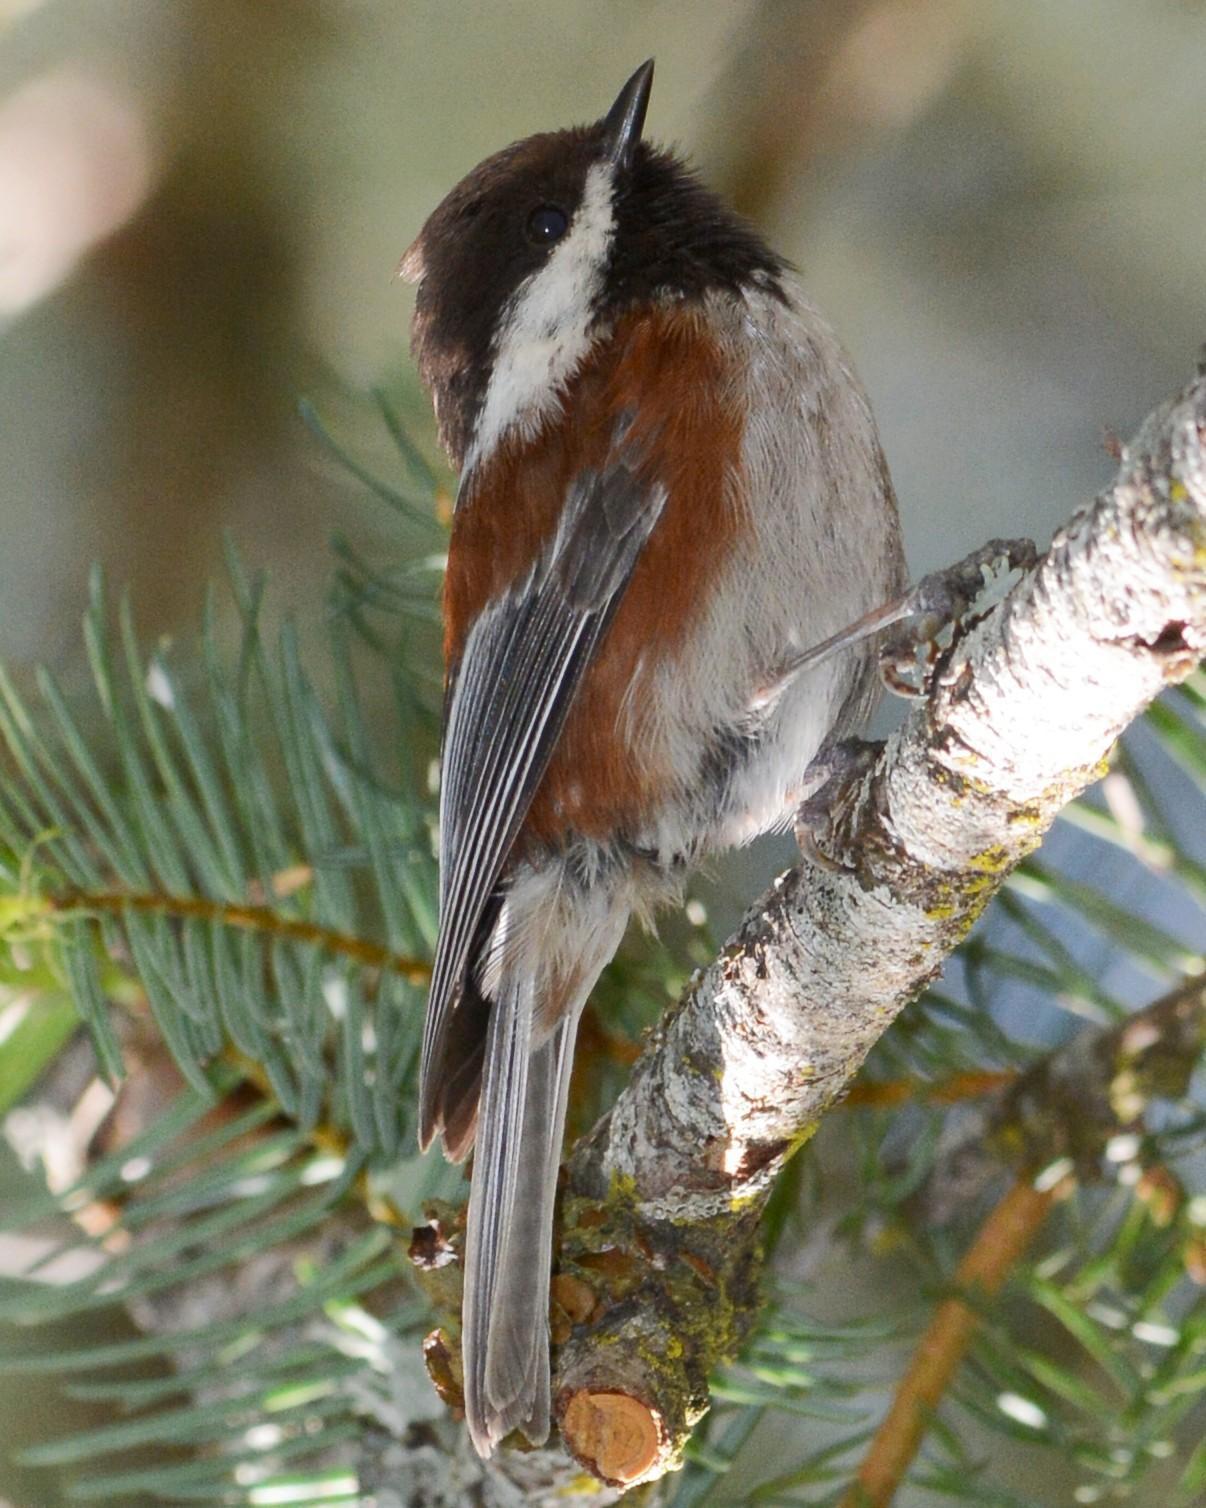 Chestnut-backed Chickadee Photo by David Hollie